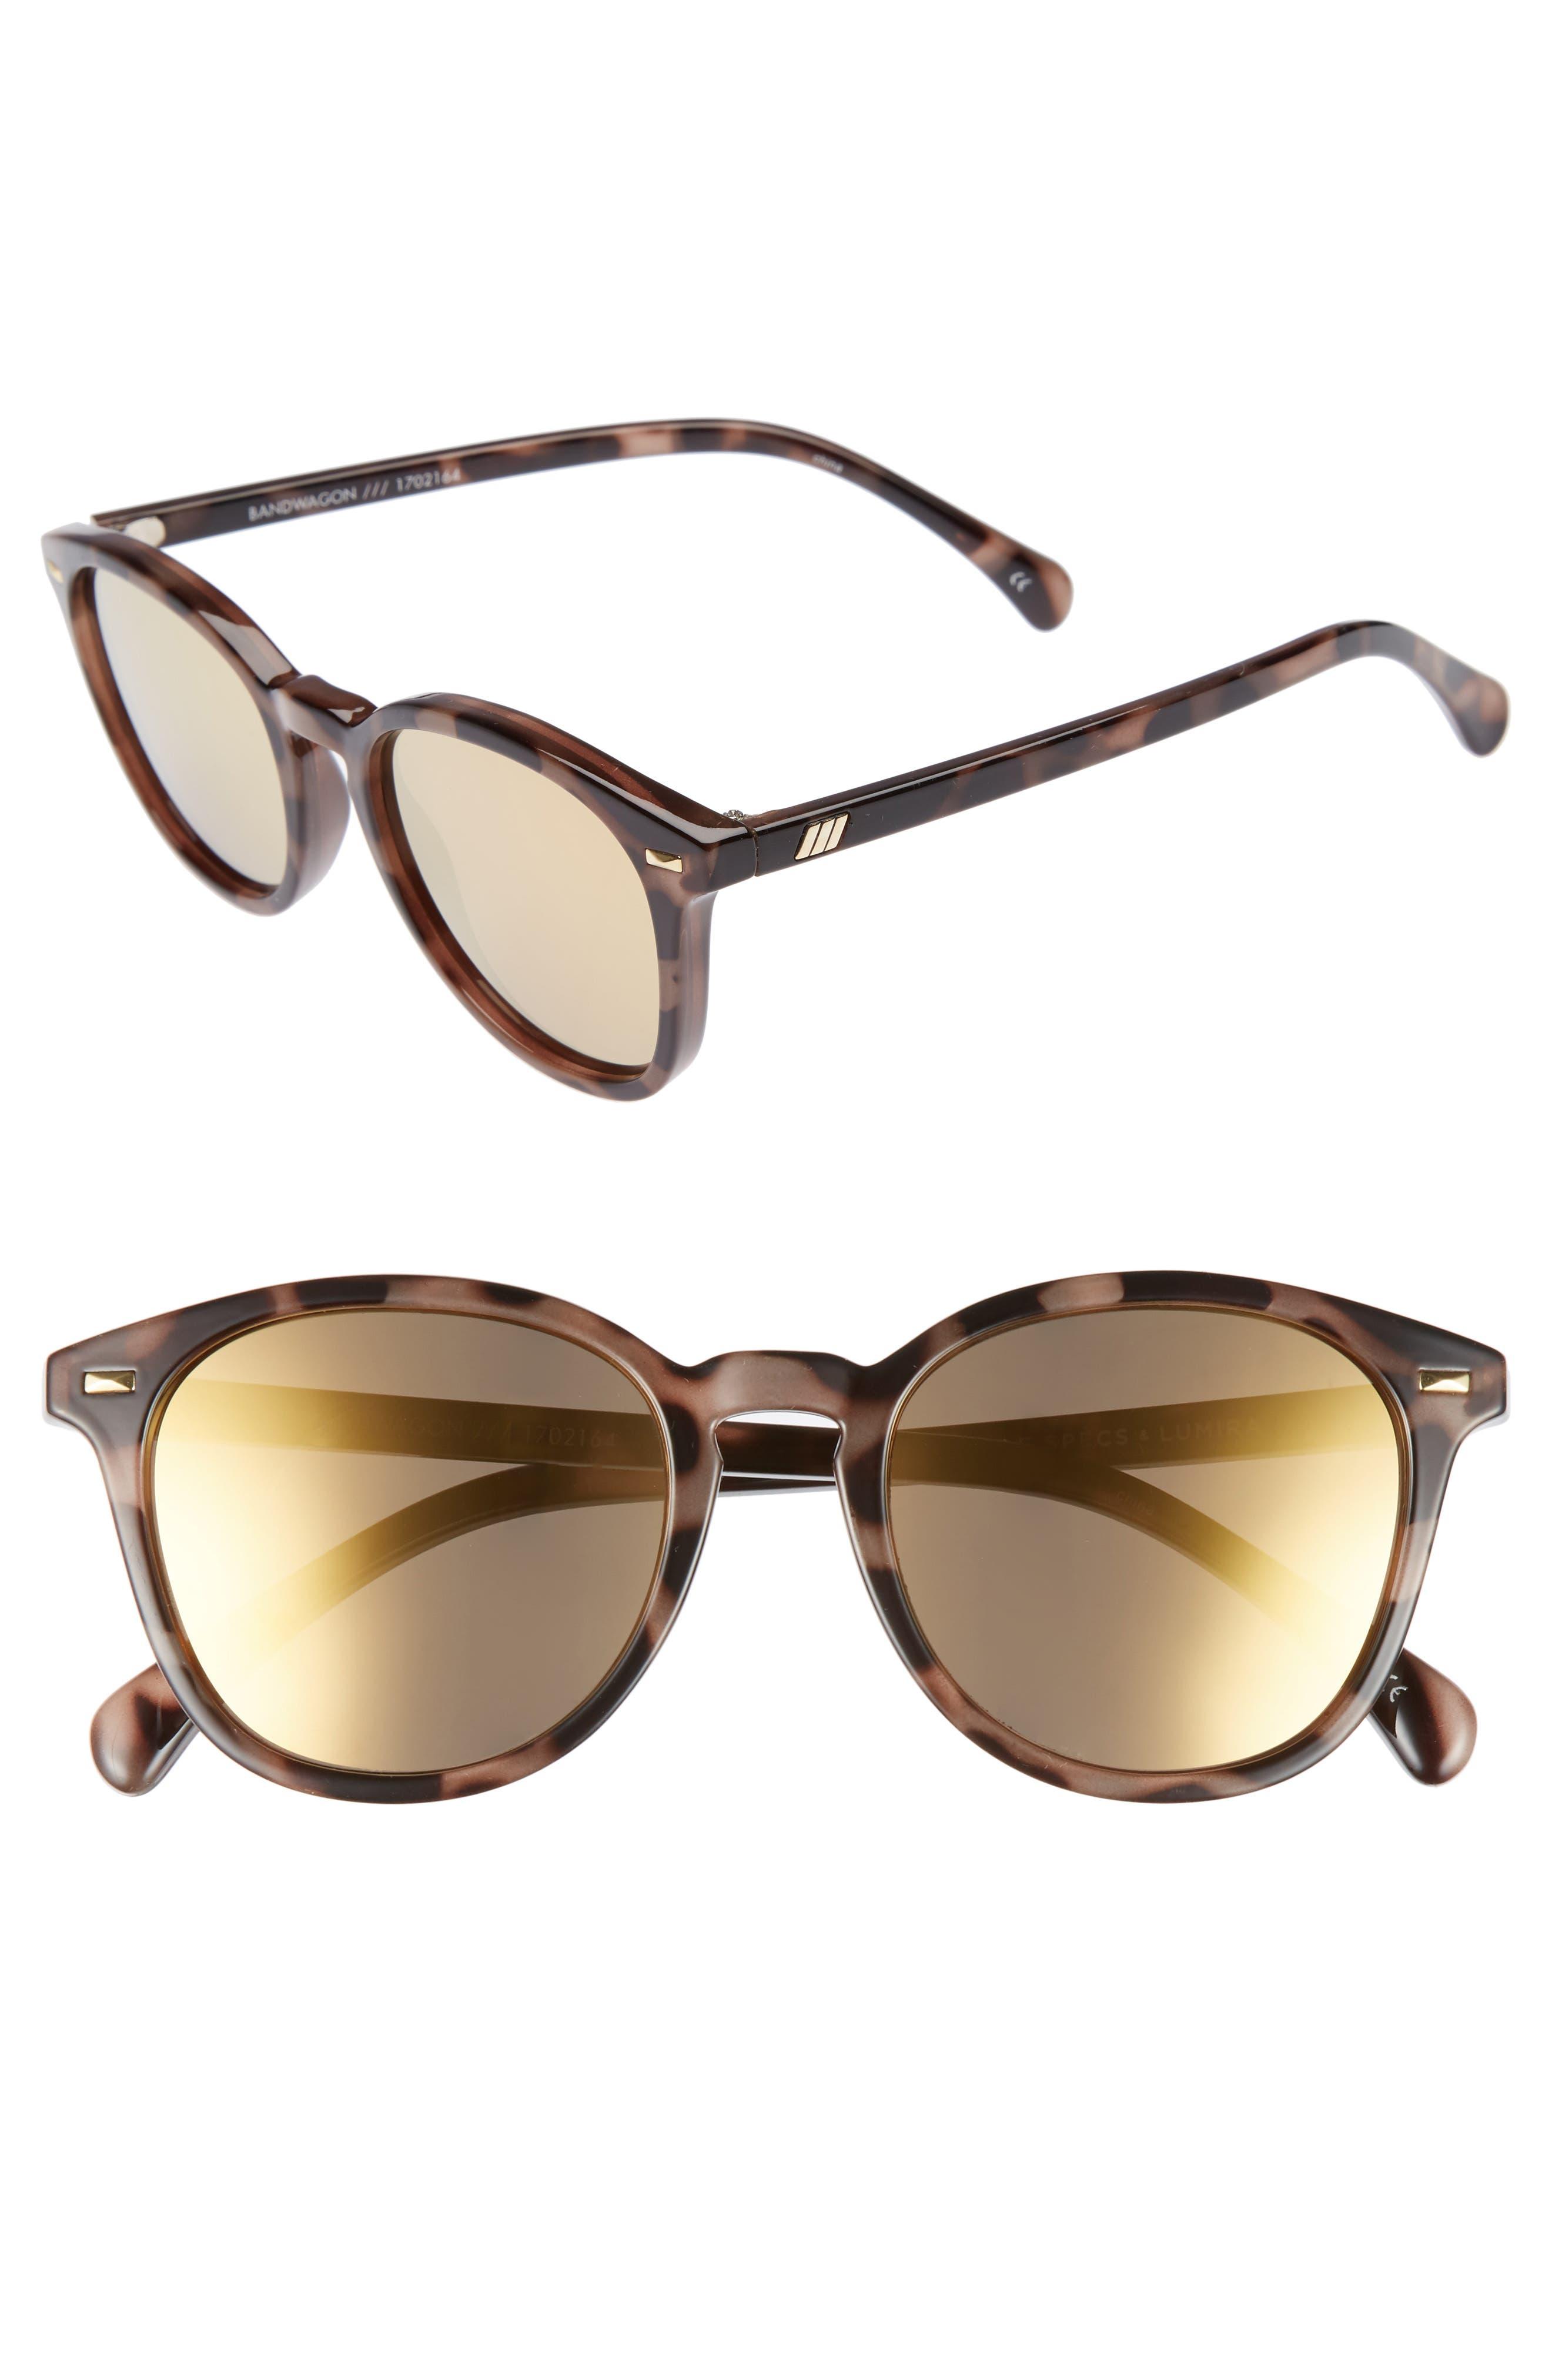 x Lumira Bandwagon 51mm Sunglasses & Candle Gift Set,                             Main thumbnail 1, color,                             Volcanic Tort